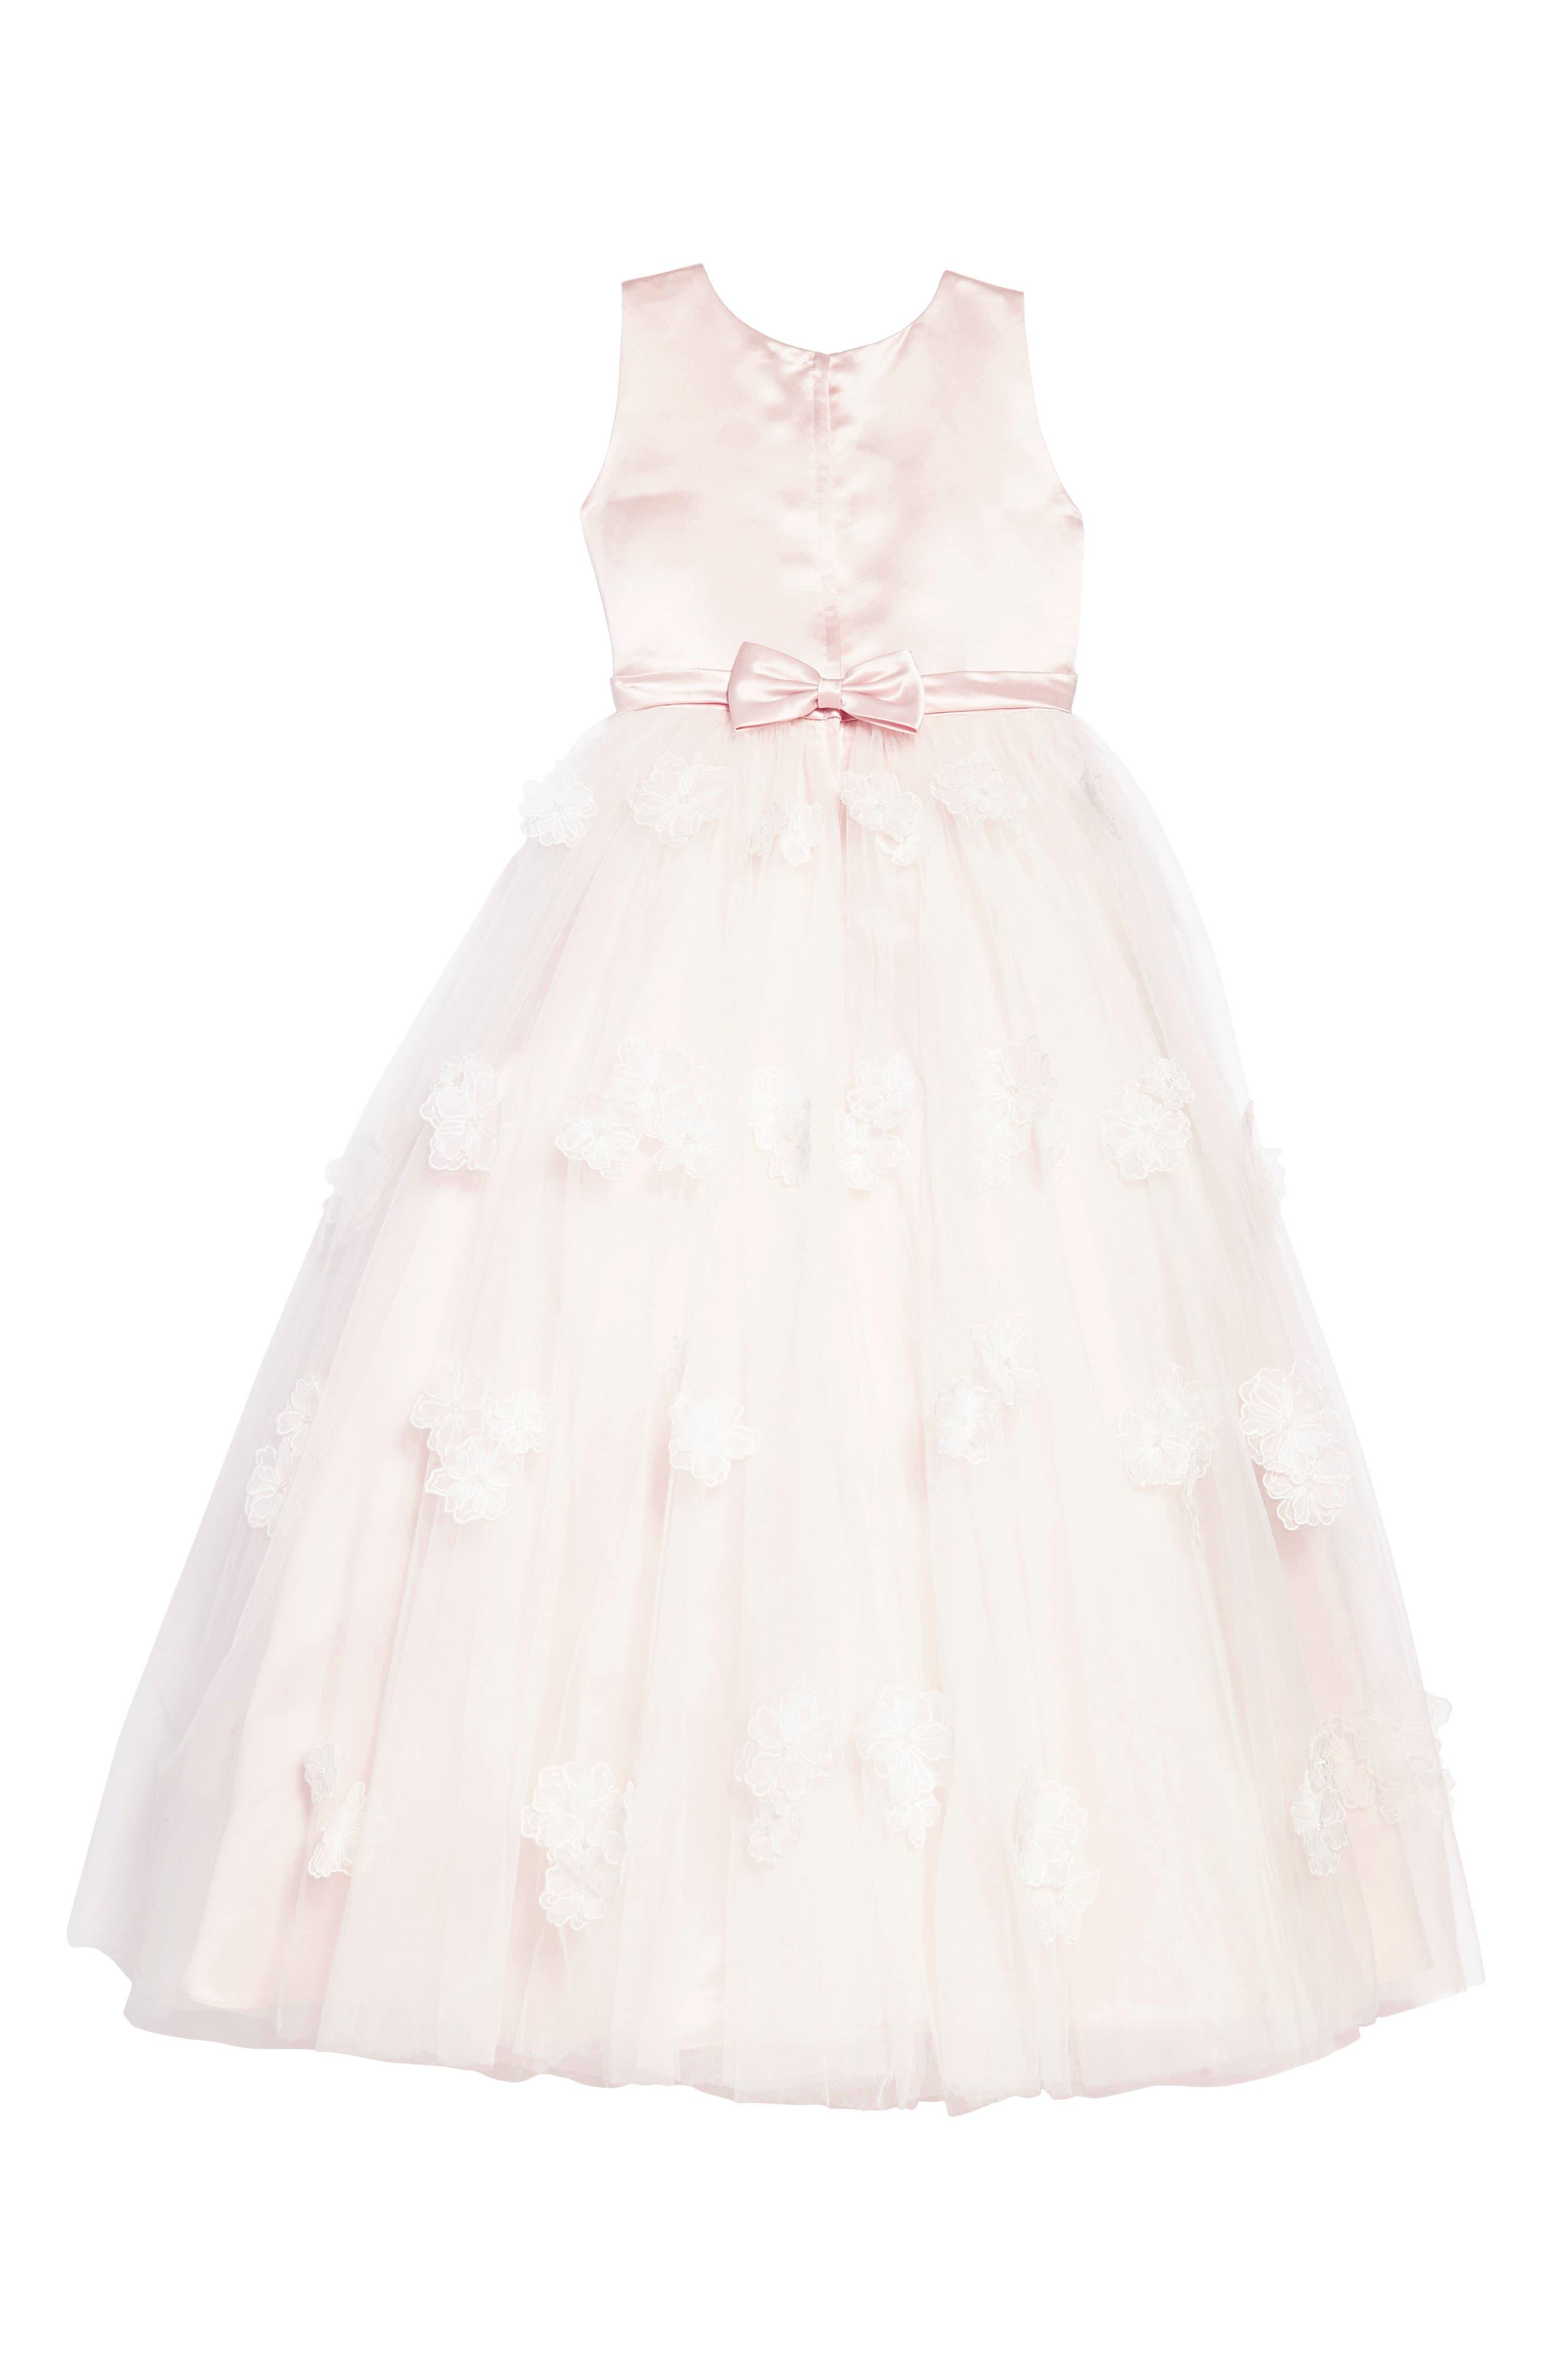 Satin & Tulle Dress,                             Alternate thumbnail 2, color,                             Petal/ Ivory